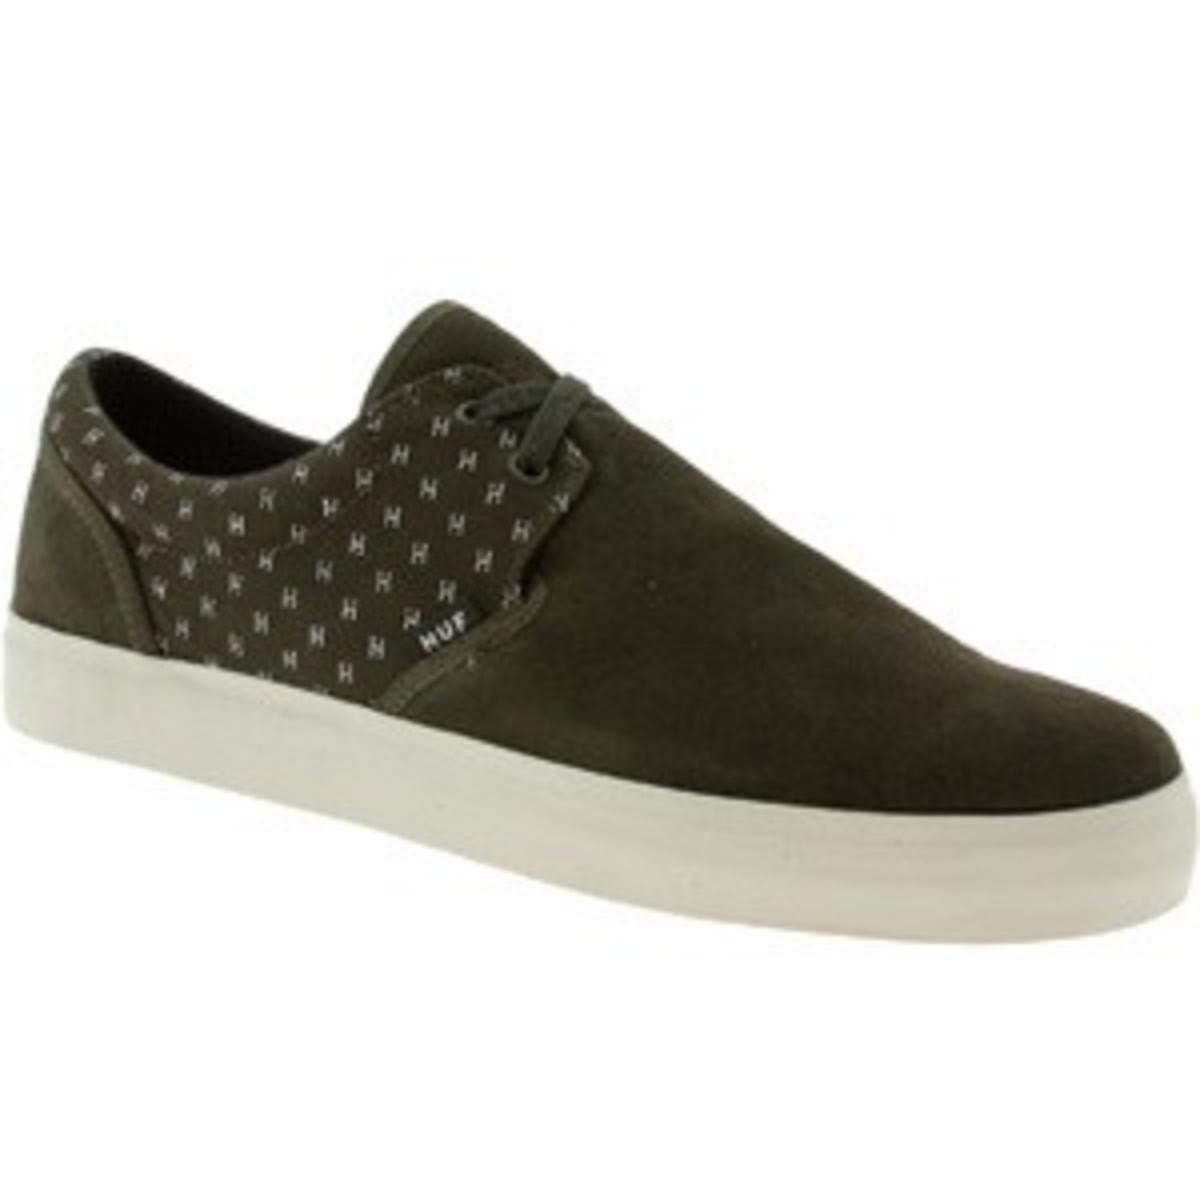 HUF- Skateboard Schuhe- Genuine-- Olive Cream  Olive Cream